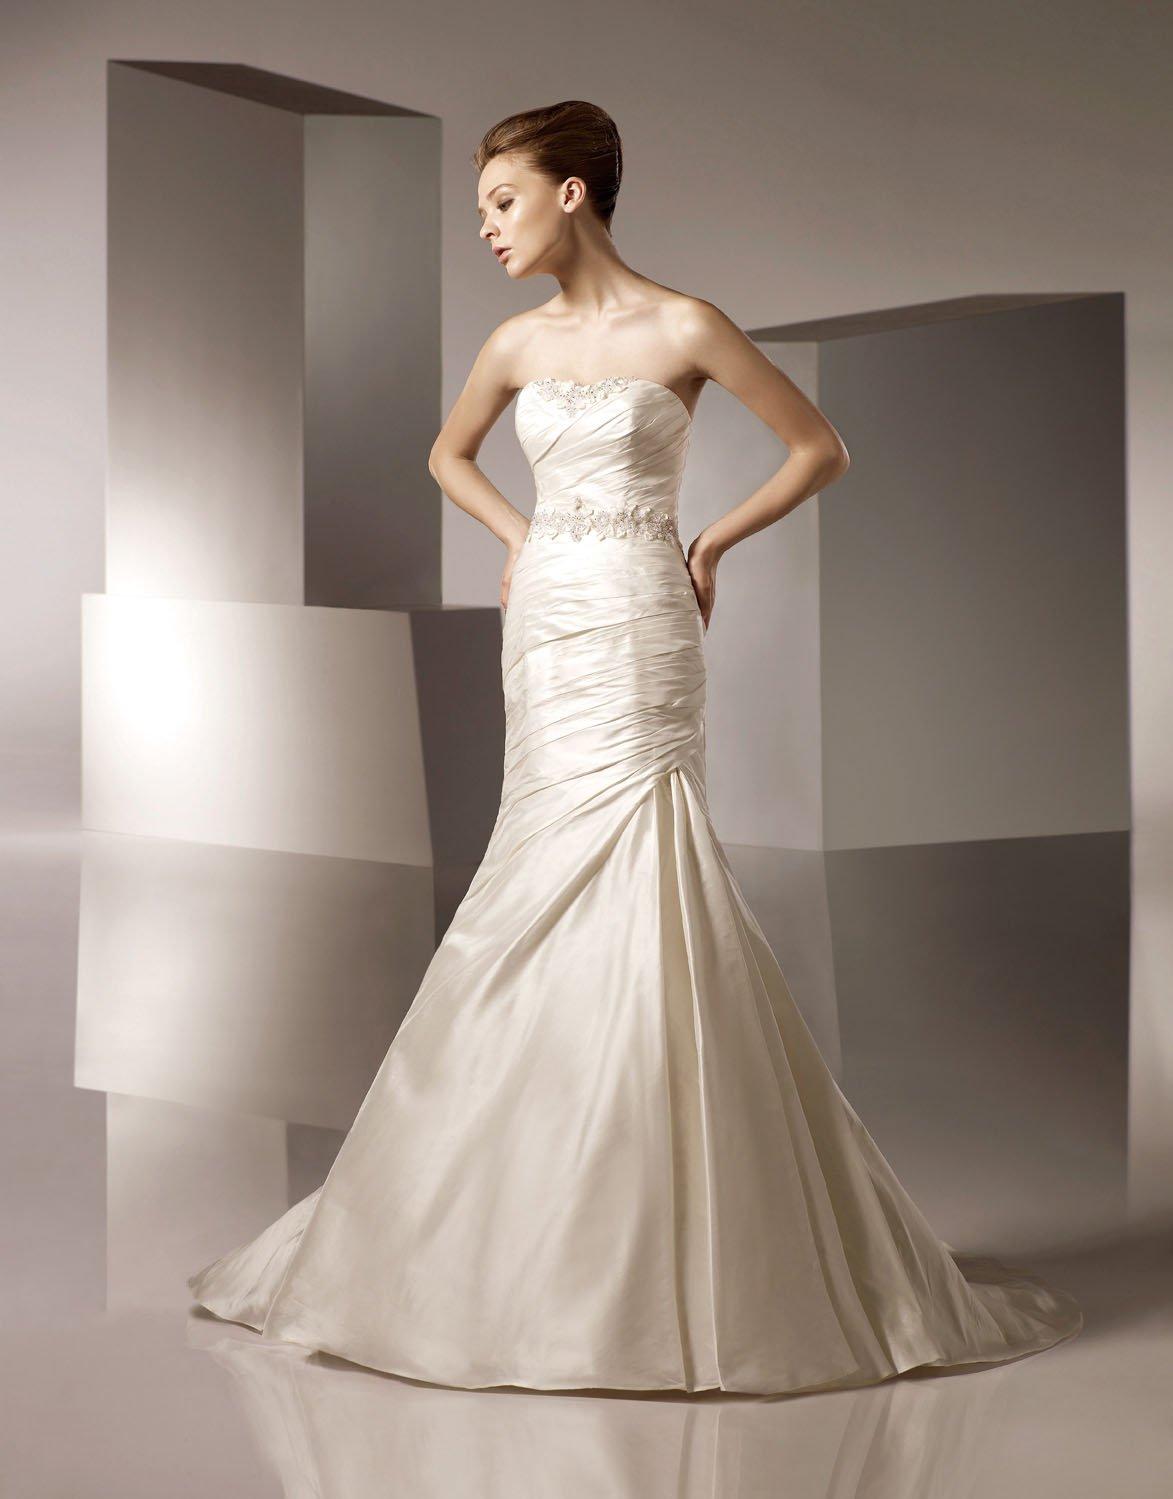 Mermaid Straight Neckline Appliqued Beading Lace-up Taffeta Wedding Dress Bridal Gown aq0025